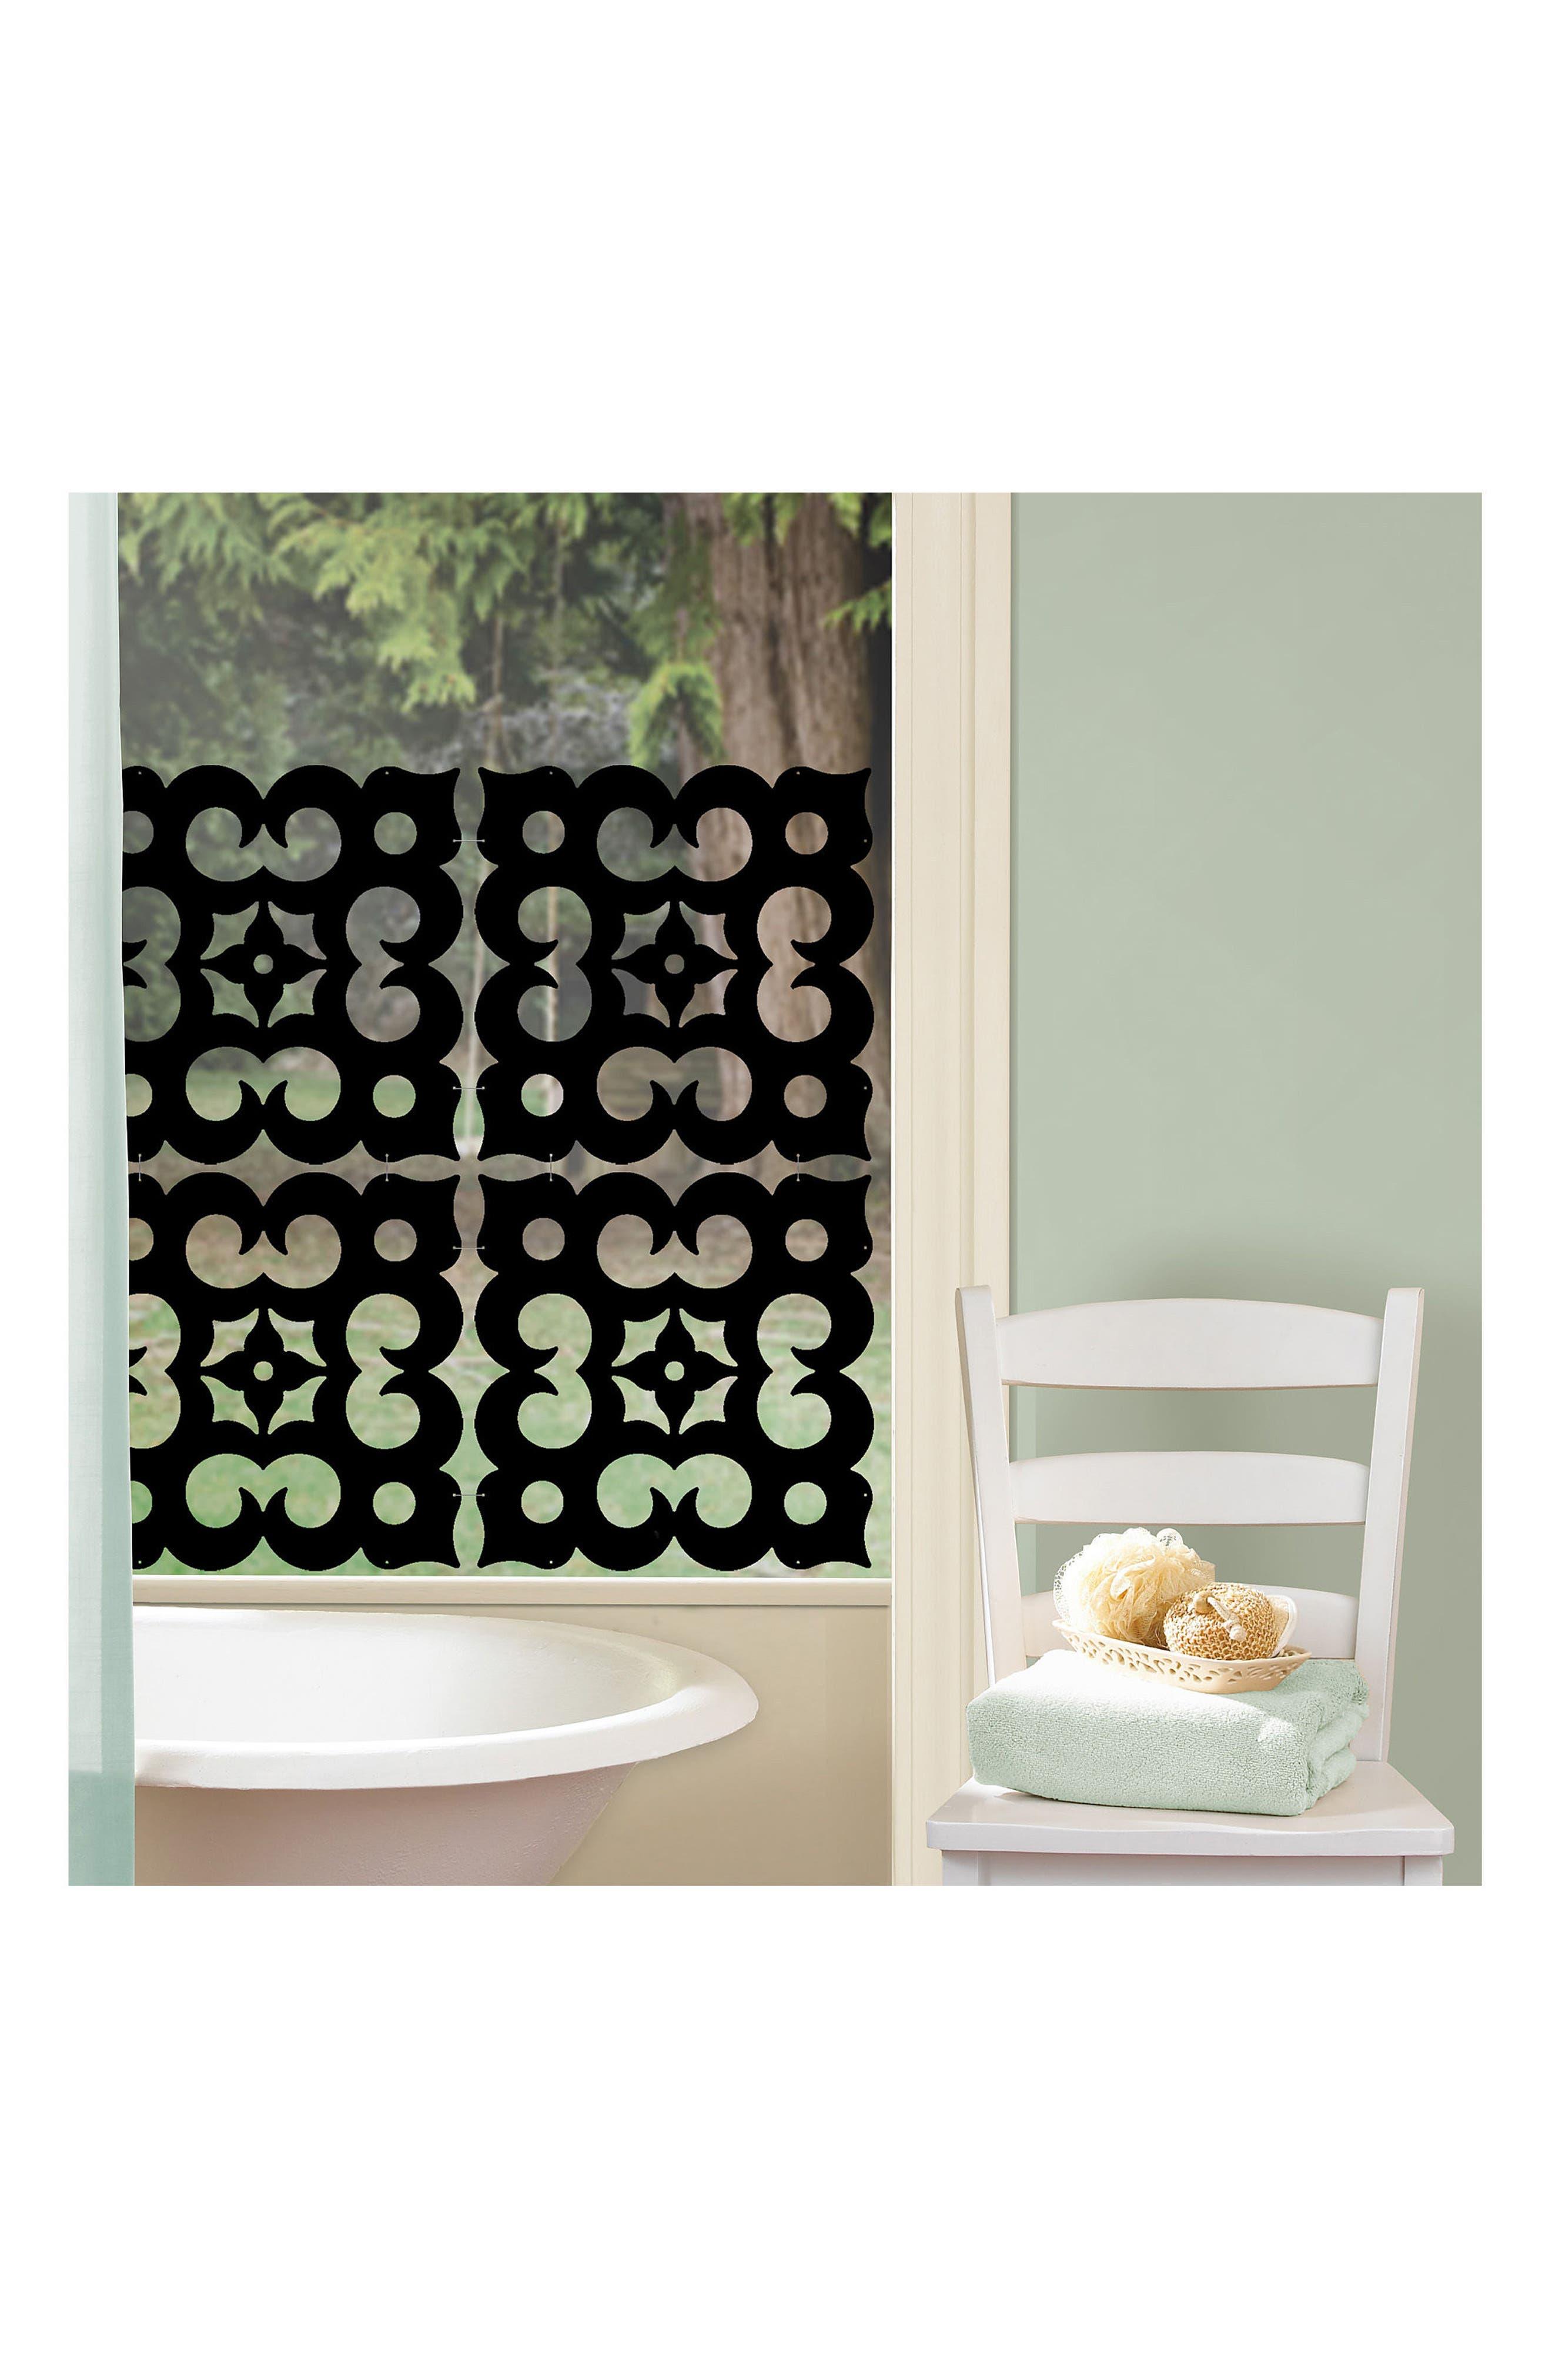 Casbah Set of 8 Room Panels,                             Alternate thumbnail 2, color,                             001